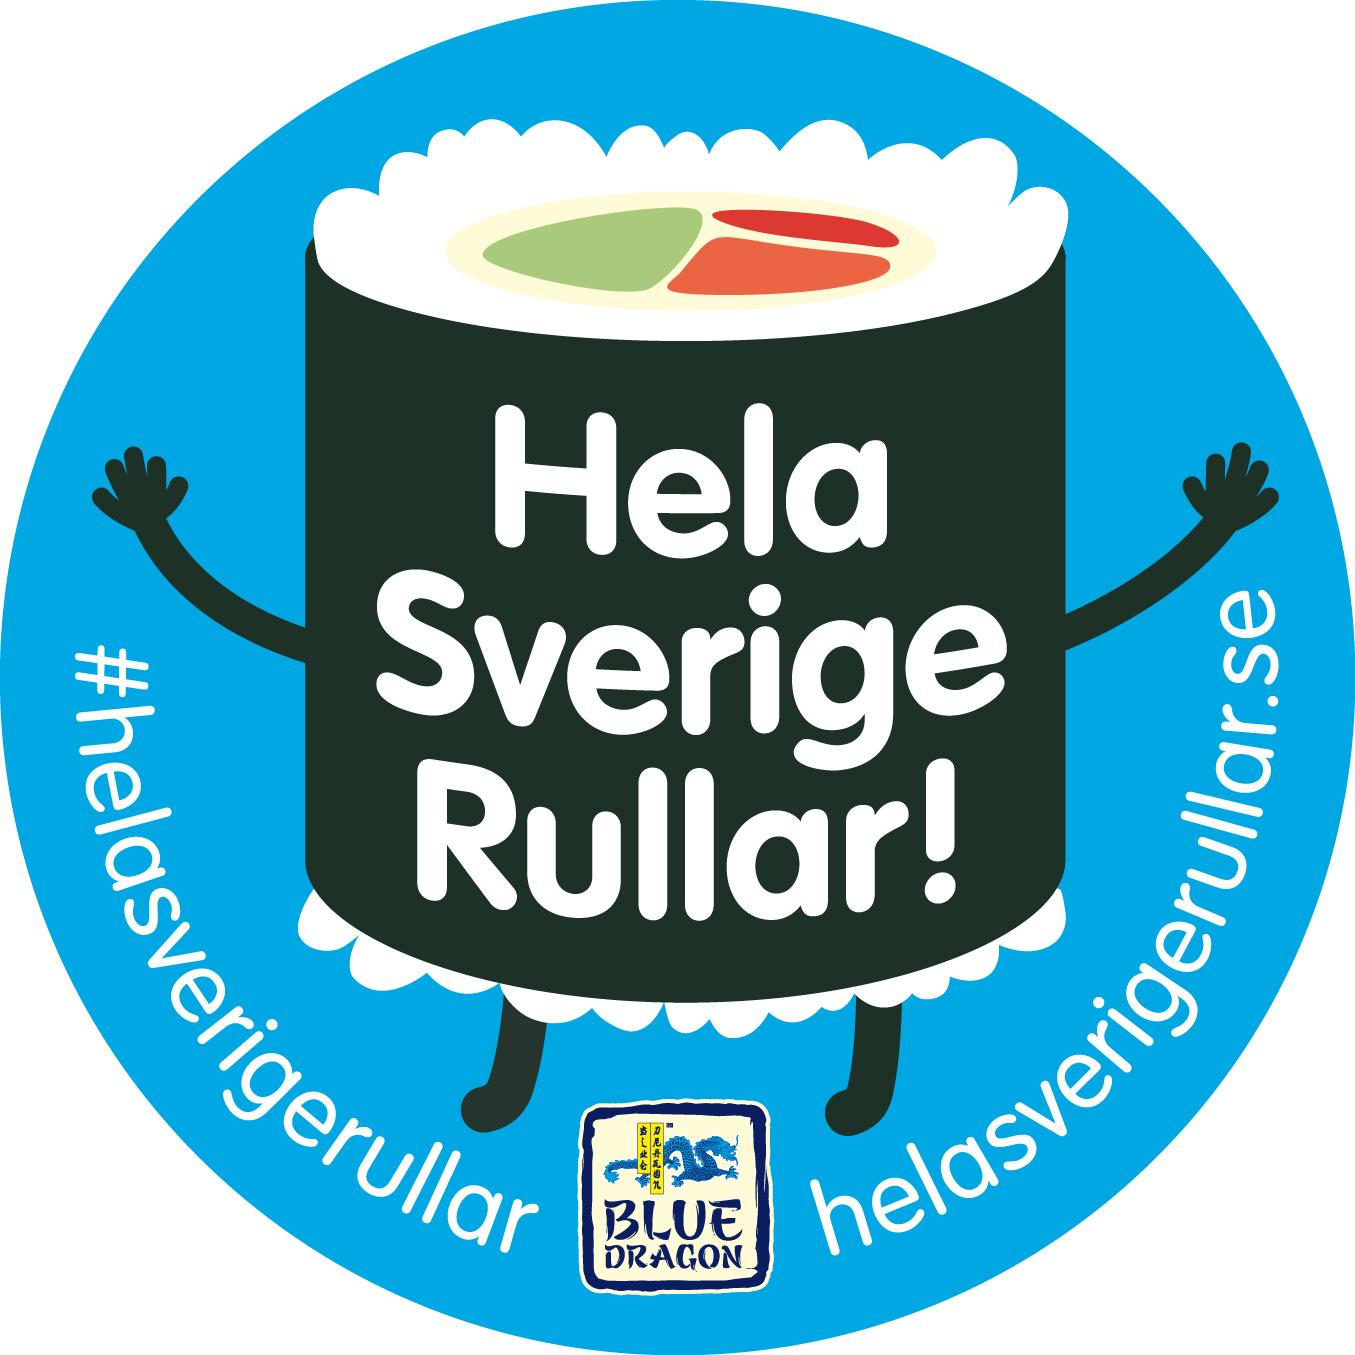 Hela Sverige Rullar!